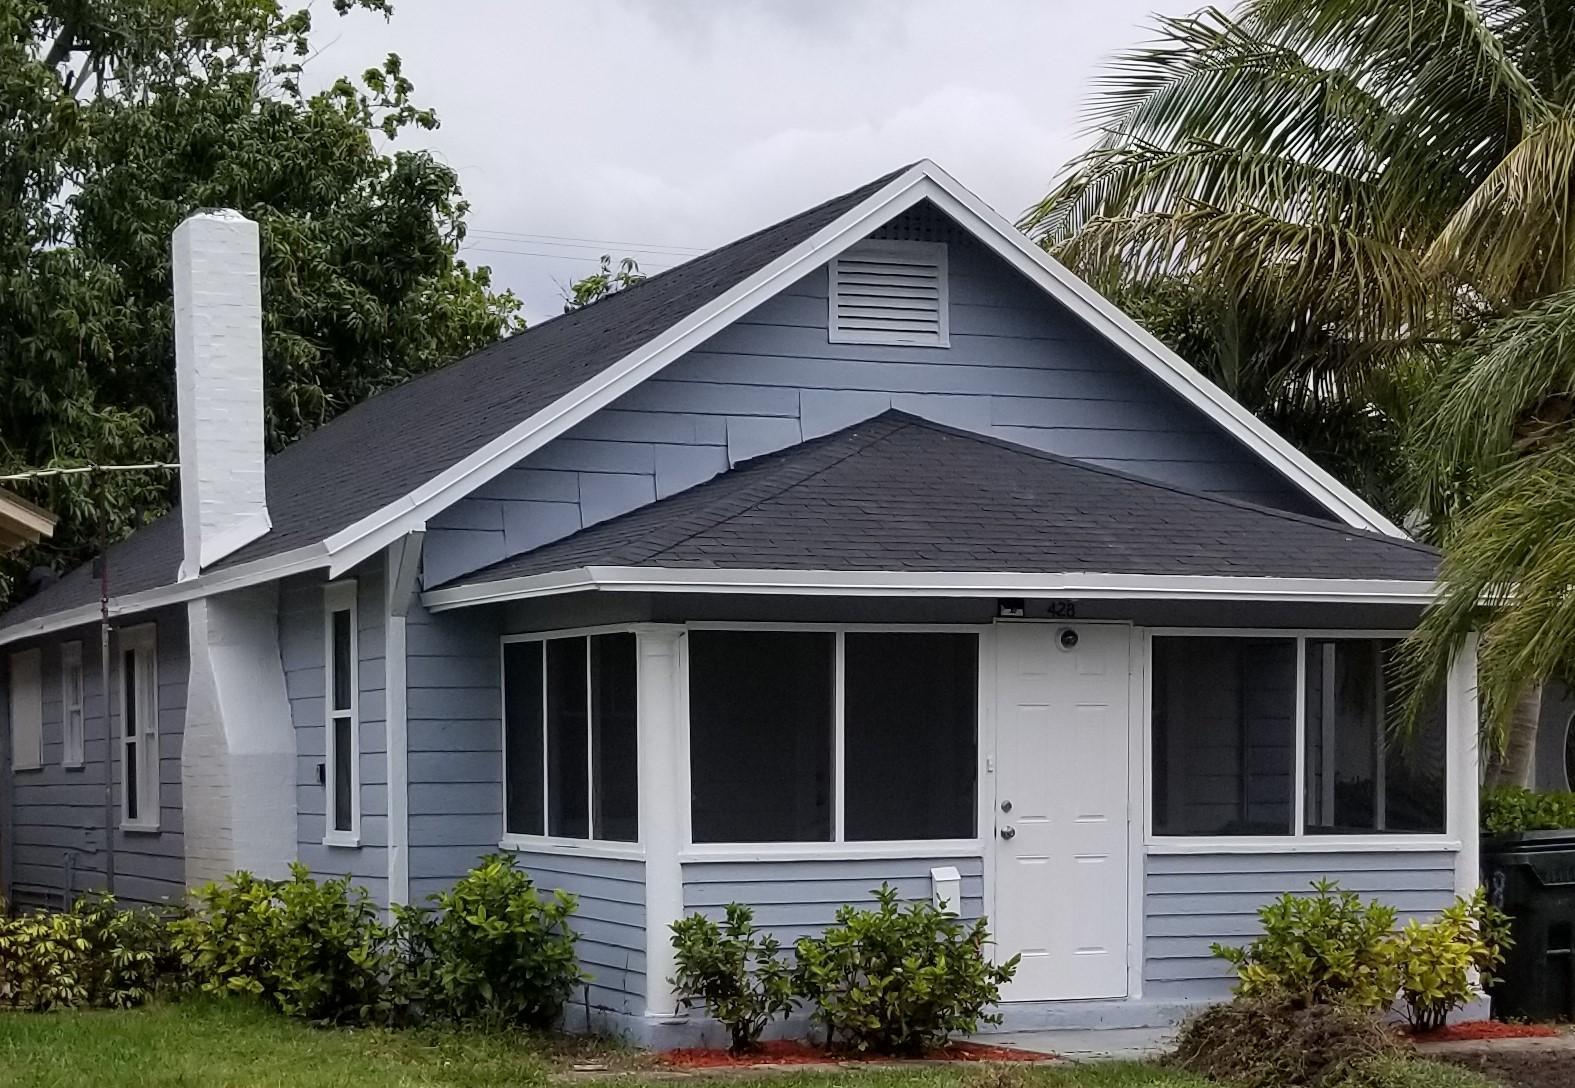 428 N H Street, Lake Worth, FL 33460